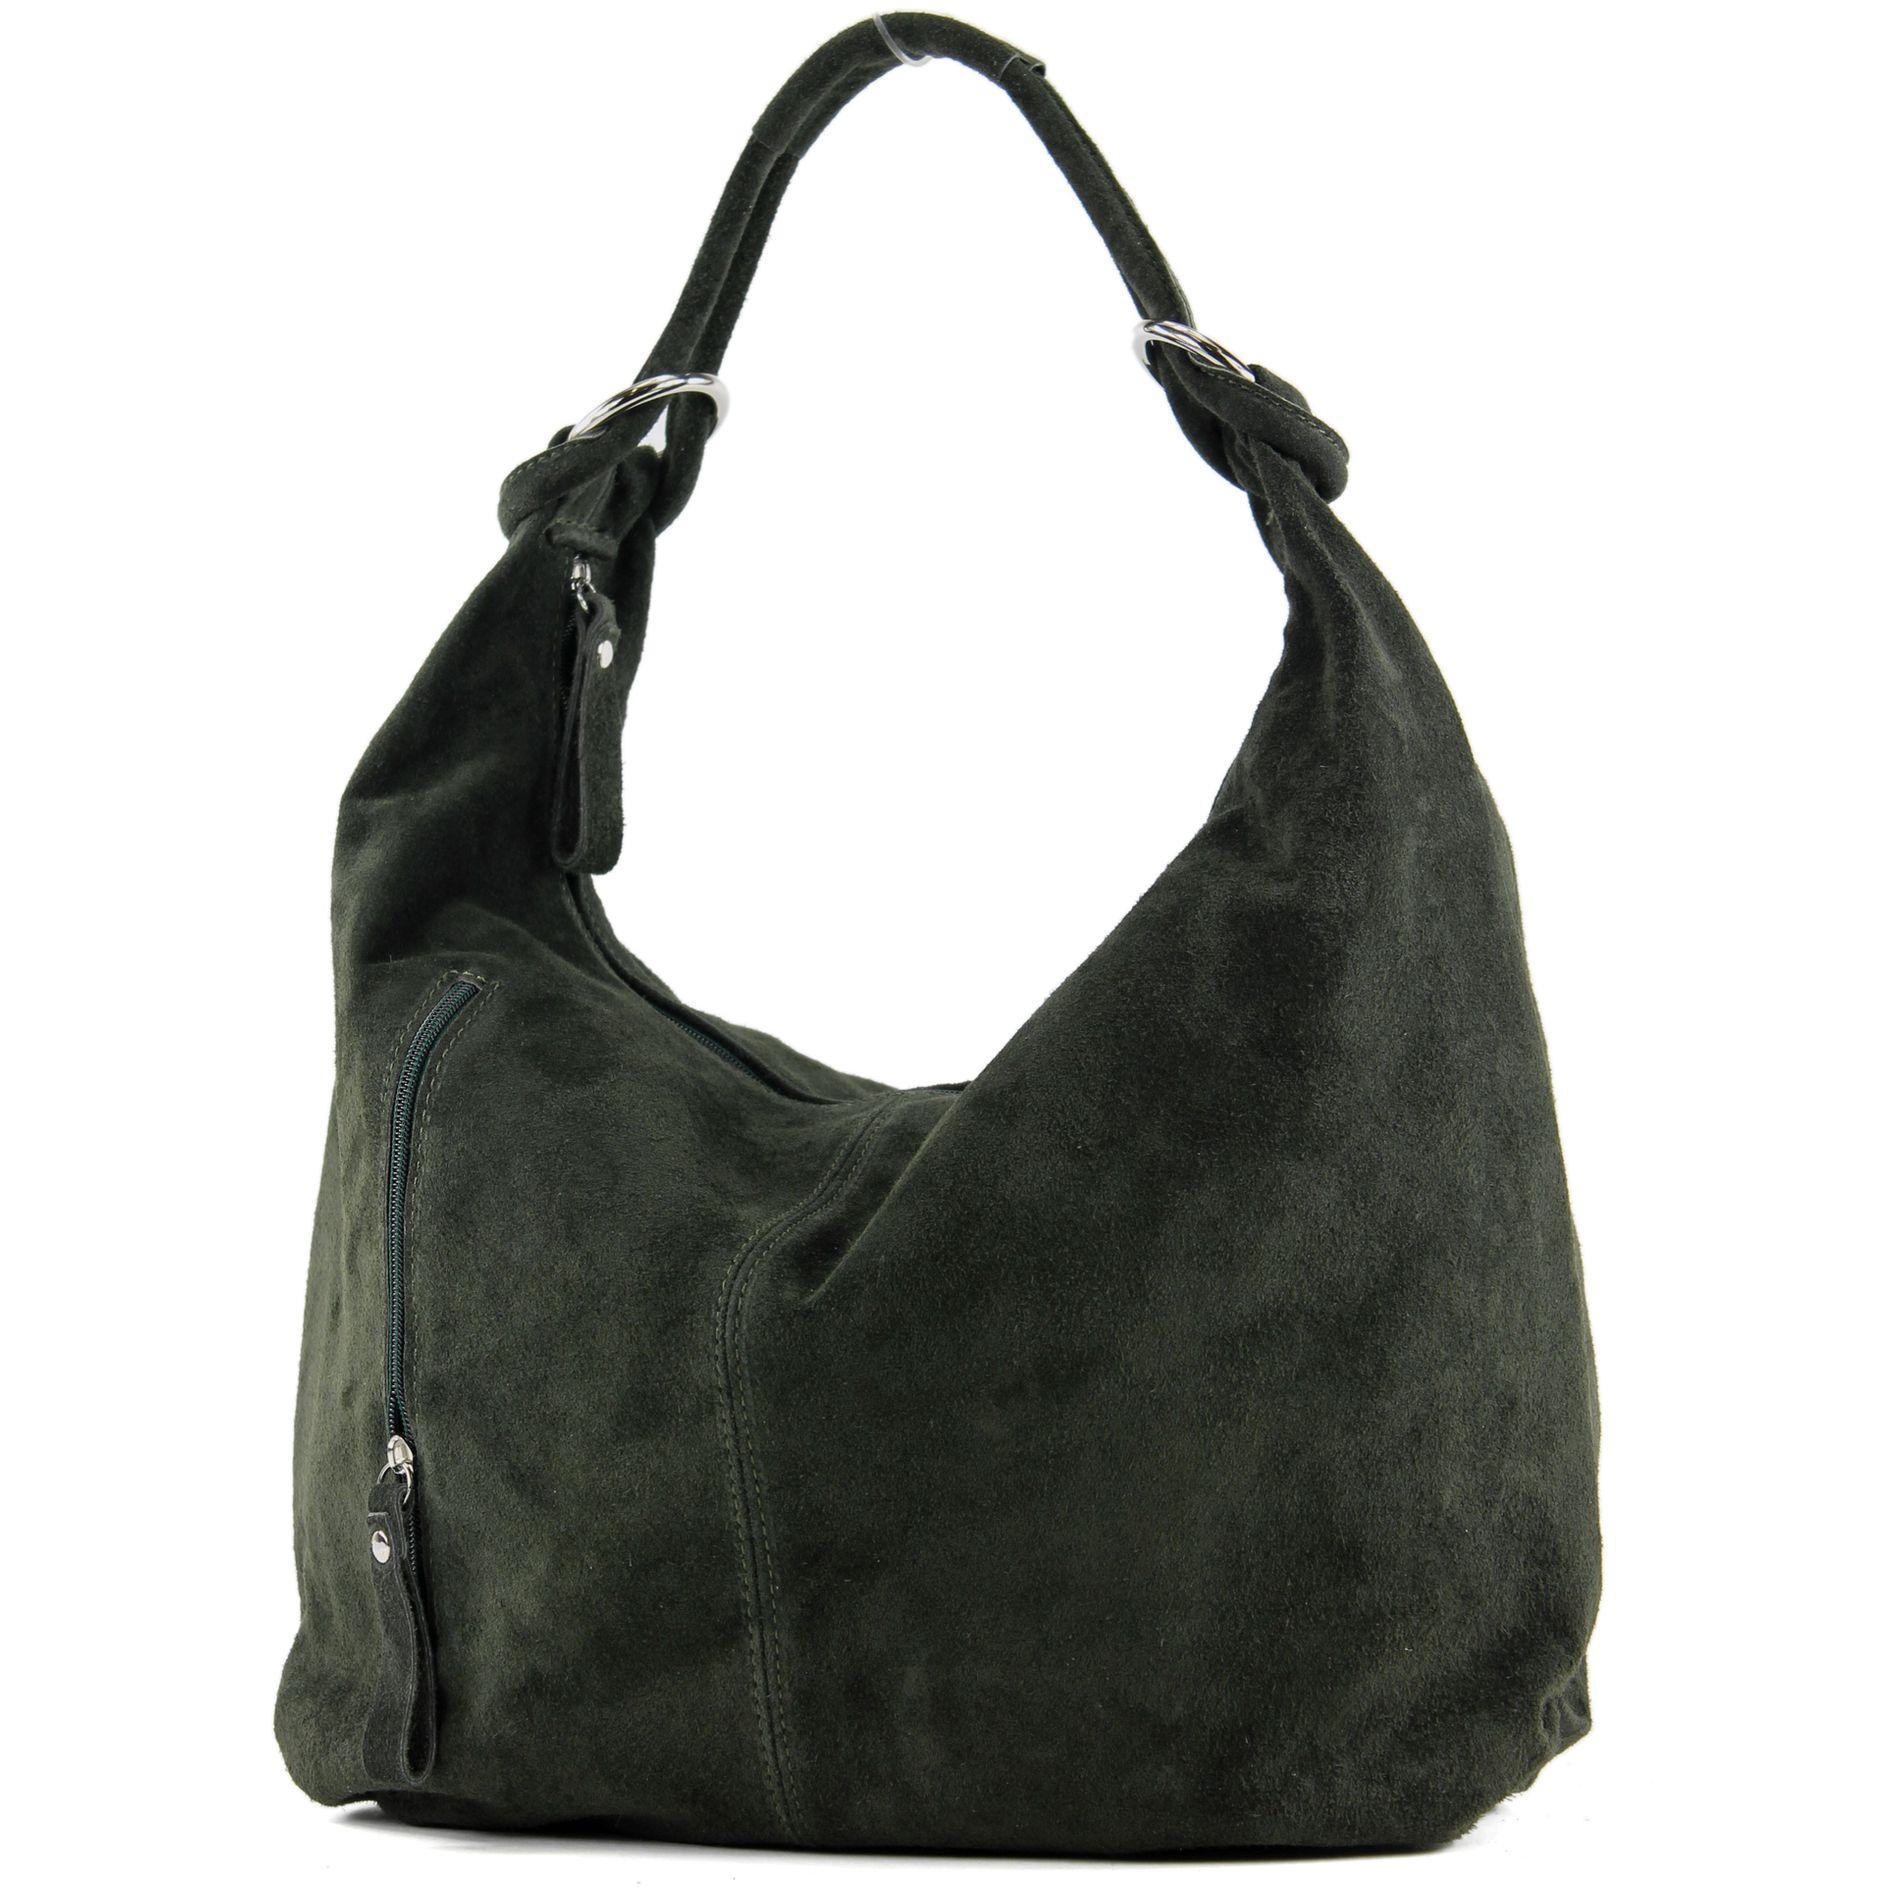 Damentasche-Gross-ital-Ledertasche-Hobo-Bag-Schultertasche-Wildleder-851T Indexbild 16